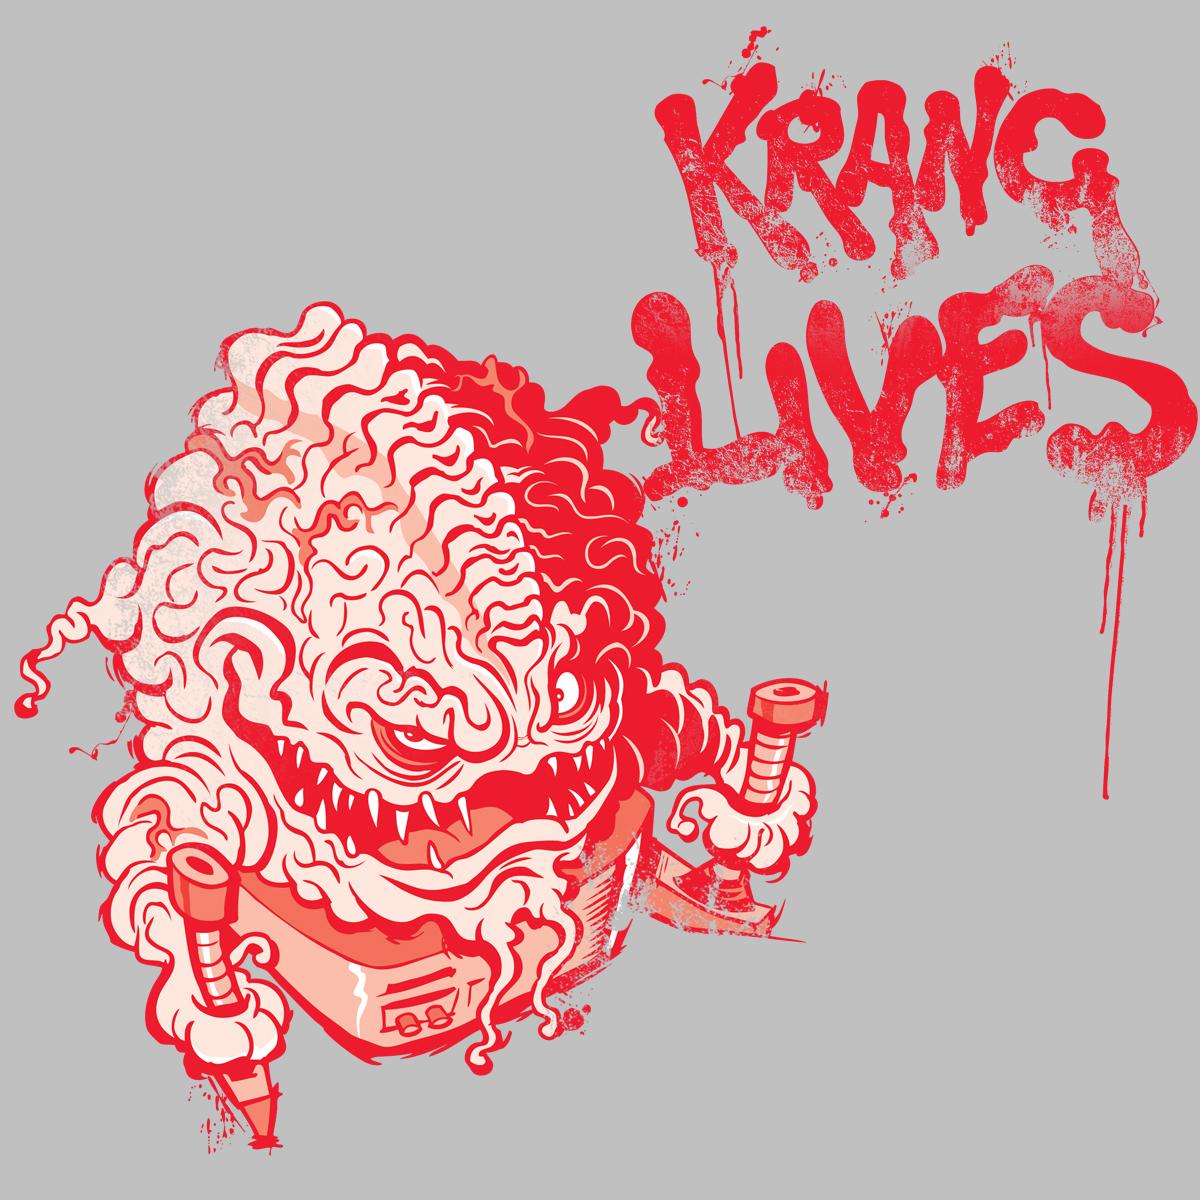 Kuato Krang